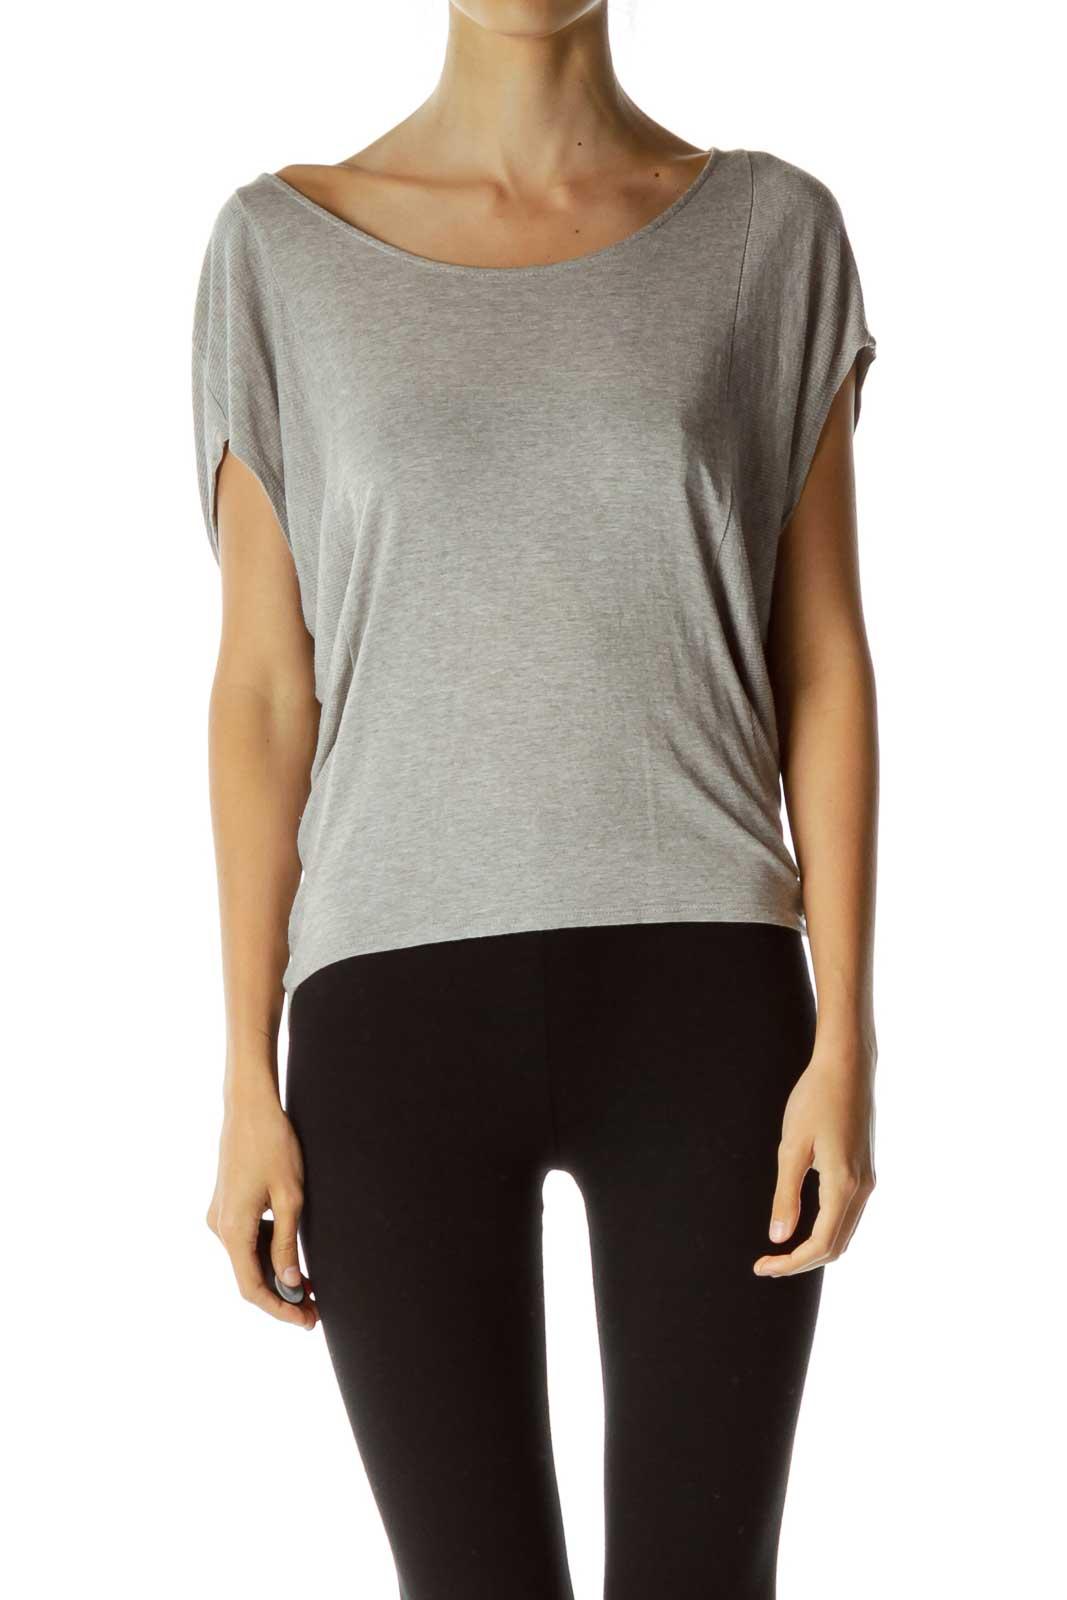 Gray Bat-Sleeve Loose T-shirt Front